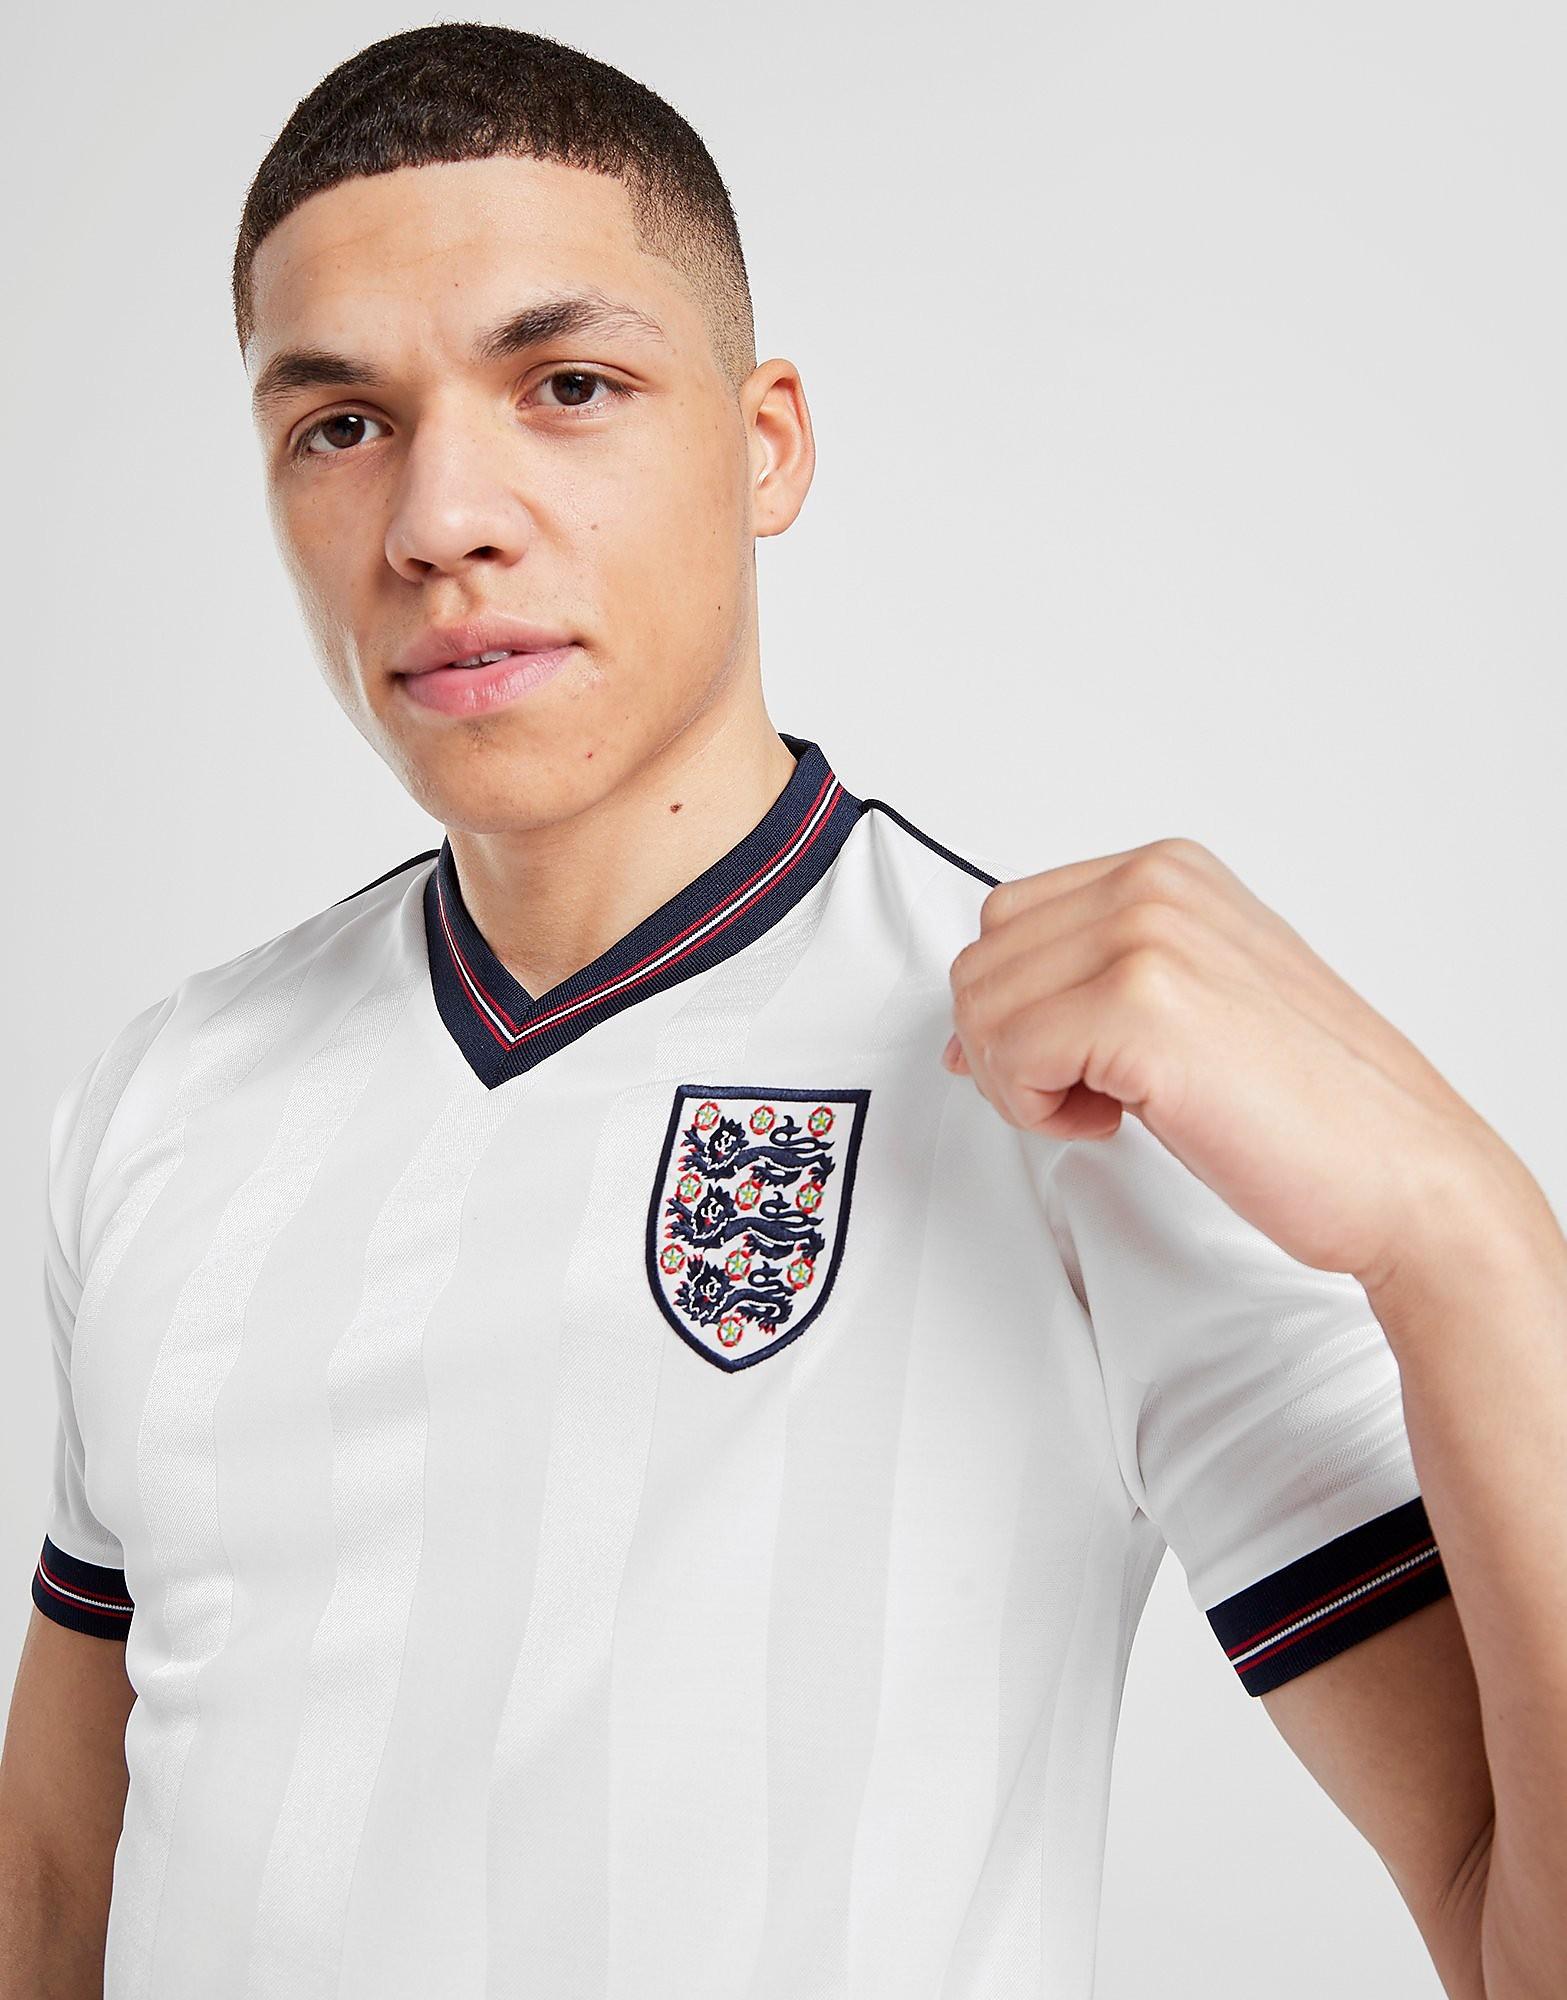 Score Draw England '86 World Cup Retro Hemmatröja Herr, Vit